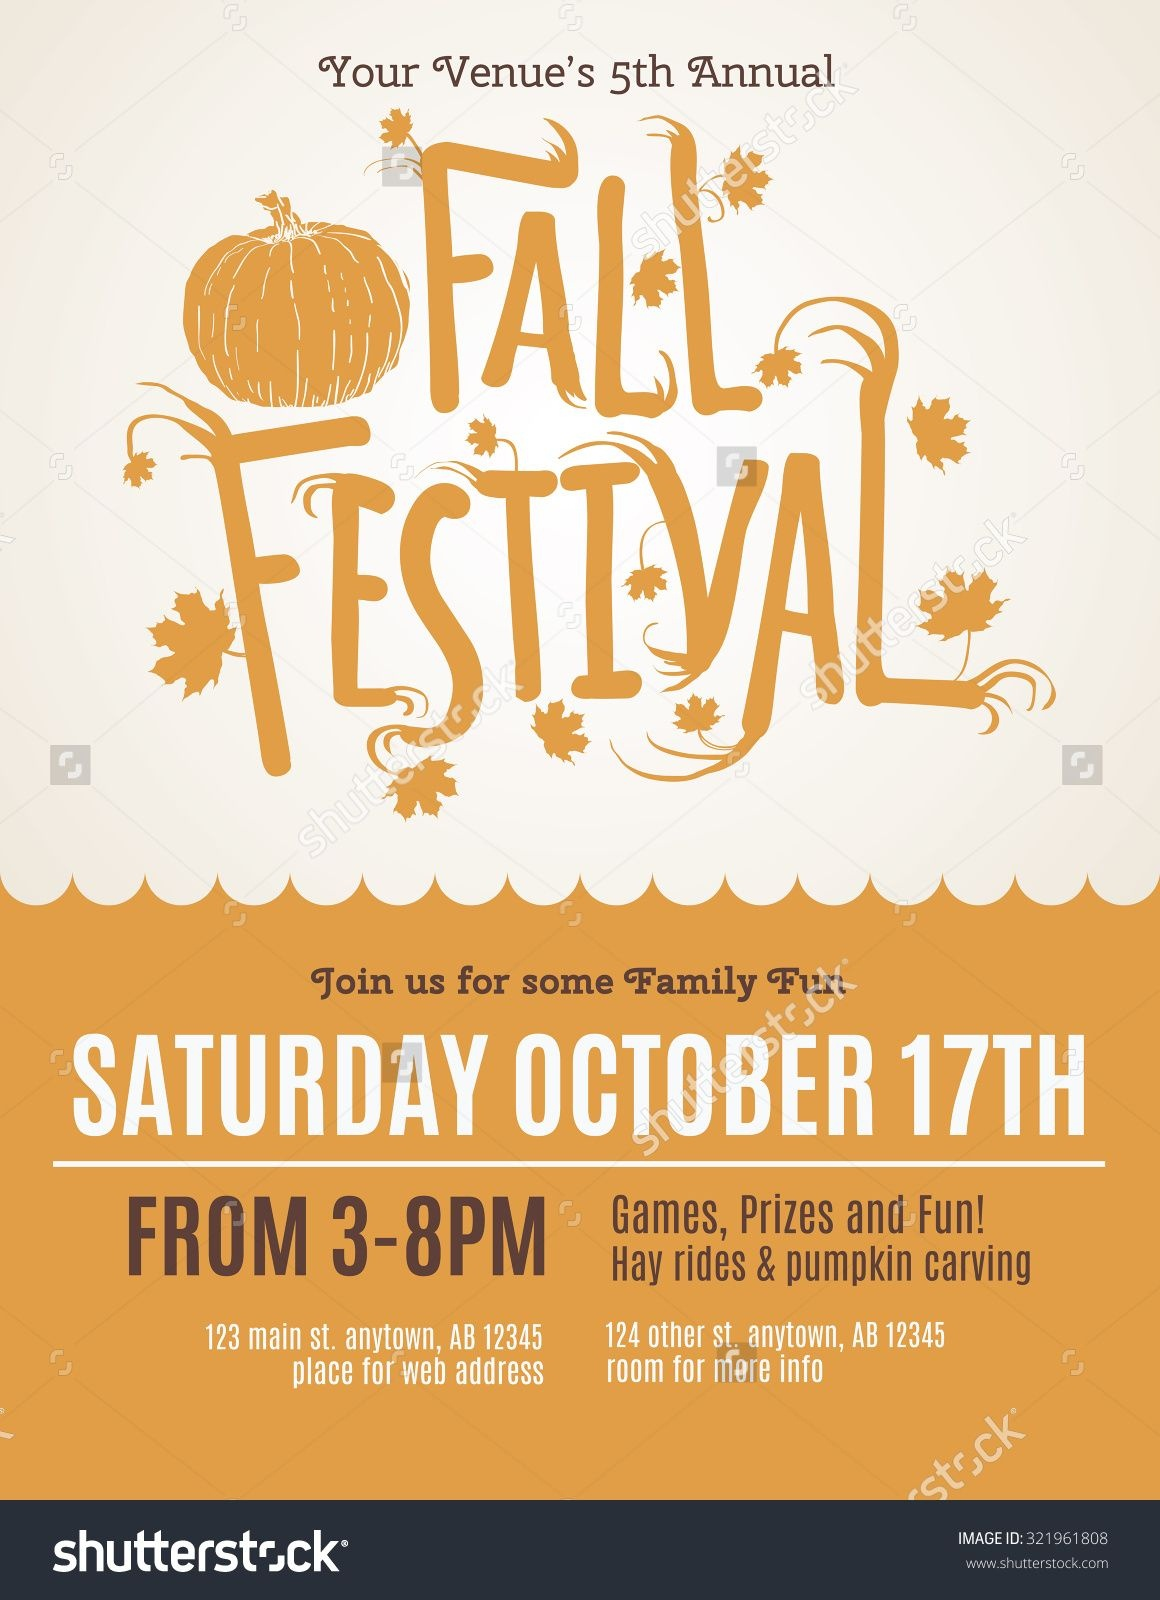 Fun Fall Festival Invitation Flyer Ilustración Vectorial En Stock - Free Printable Fall Festival Invitations